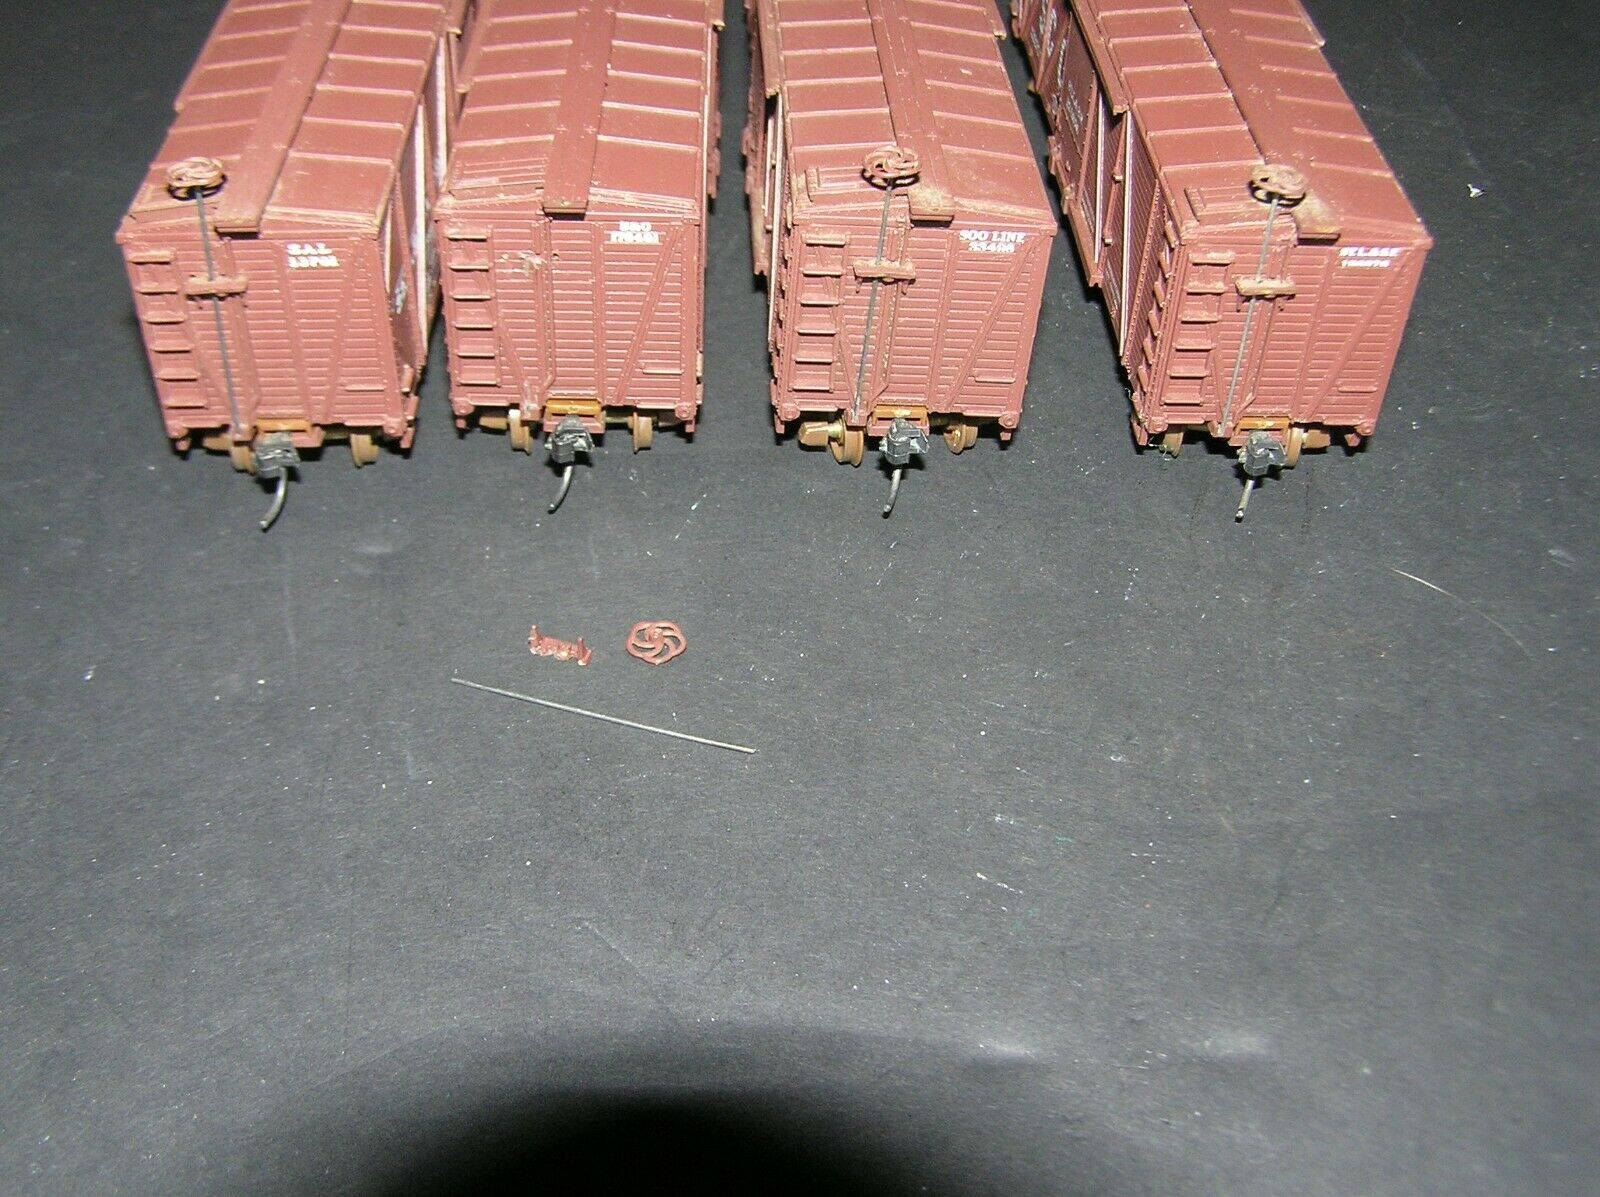 Walthers 4 HO 40' vagoni, Soo linee, Baltimore & Ohio, COSTA & SAN FRANCISCO